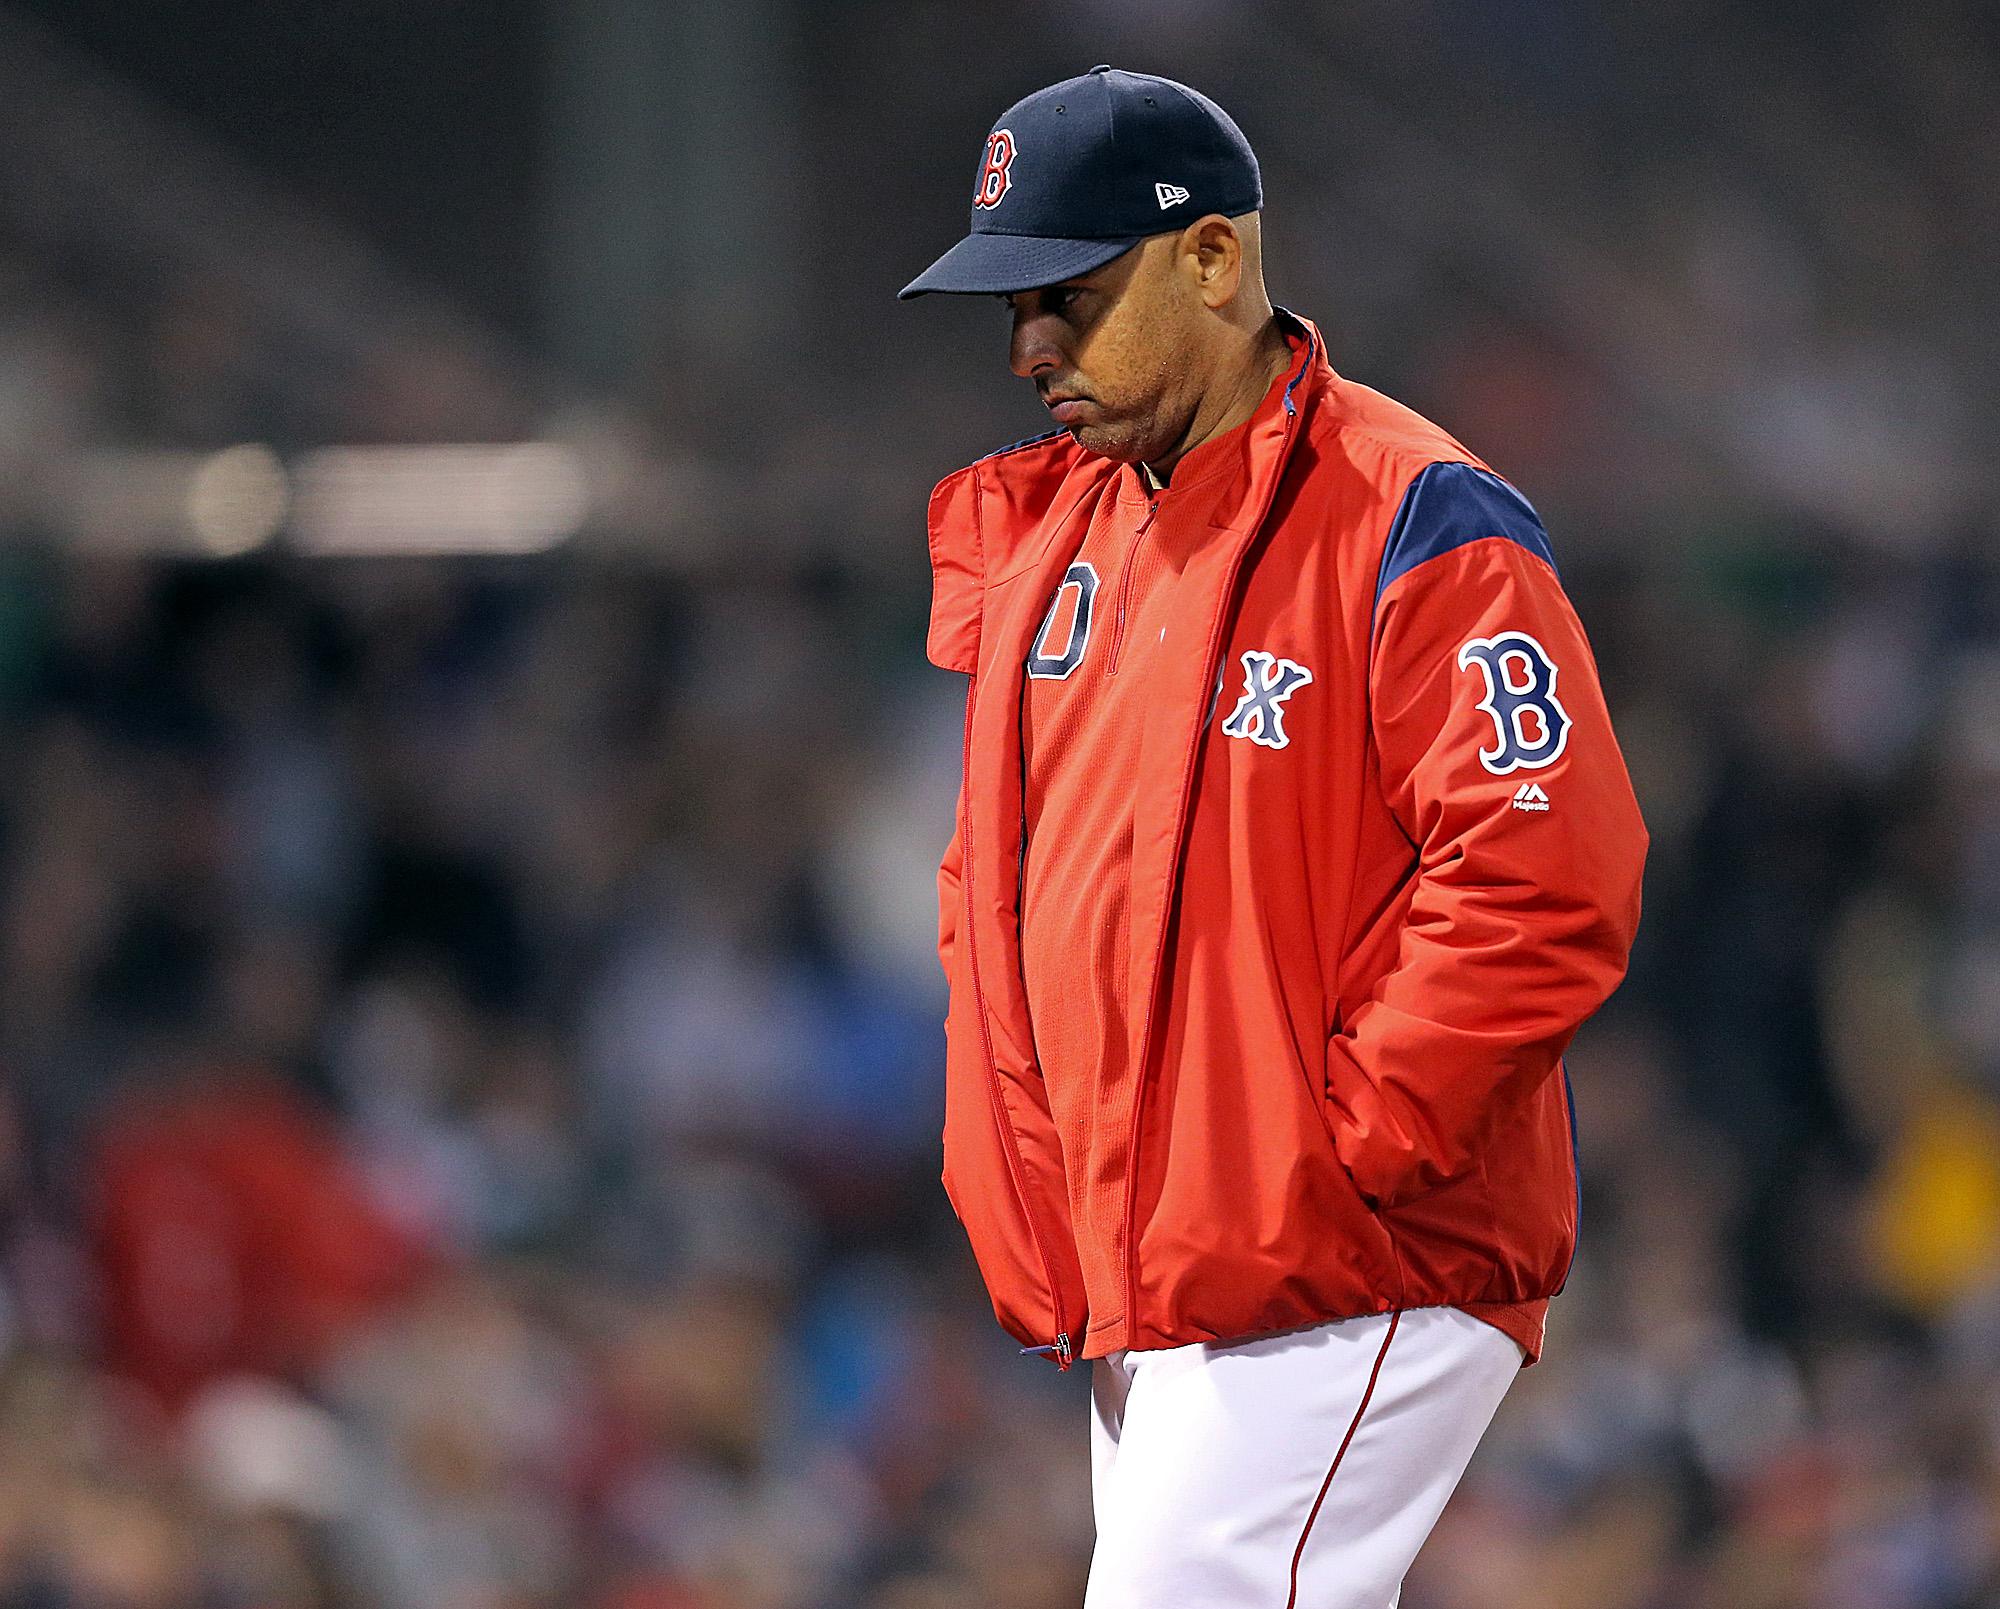 Boston Red Sox vs San Francisco Giants